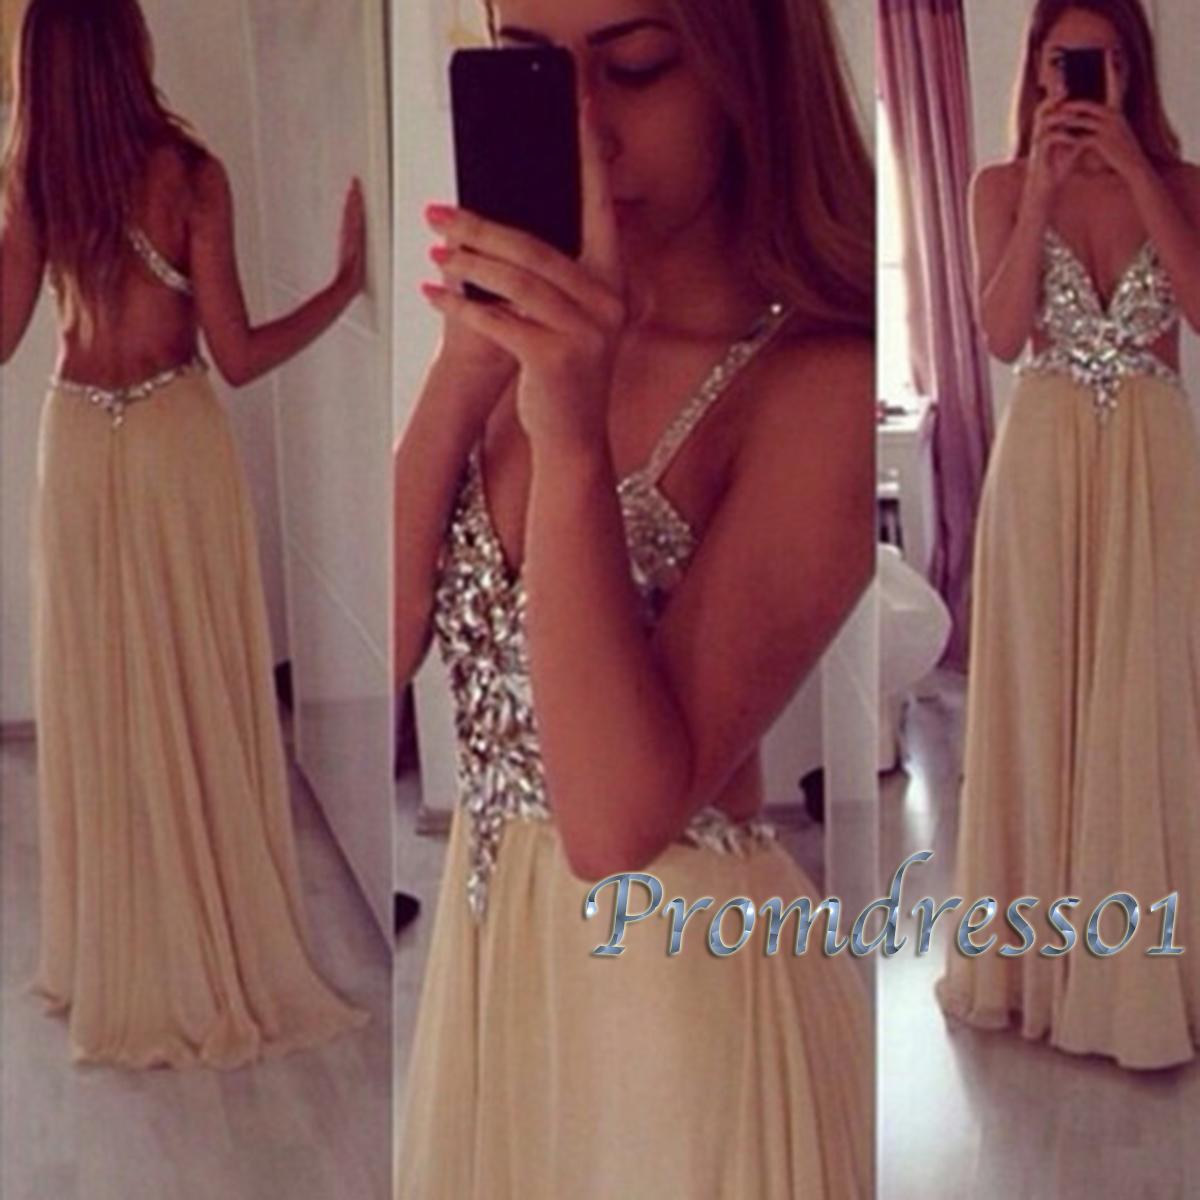 Tumblr Teens Champaign Color Dresses